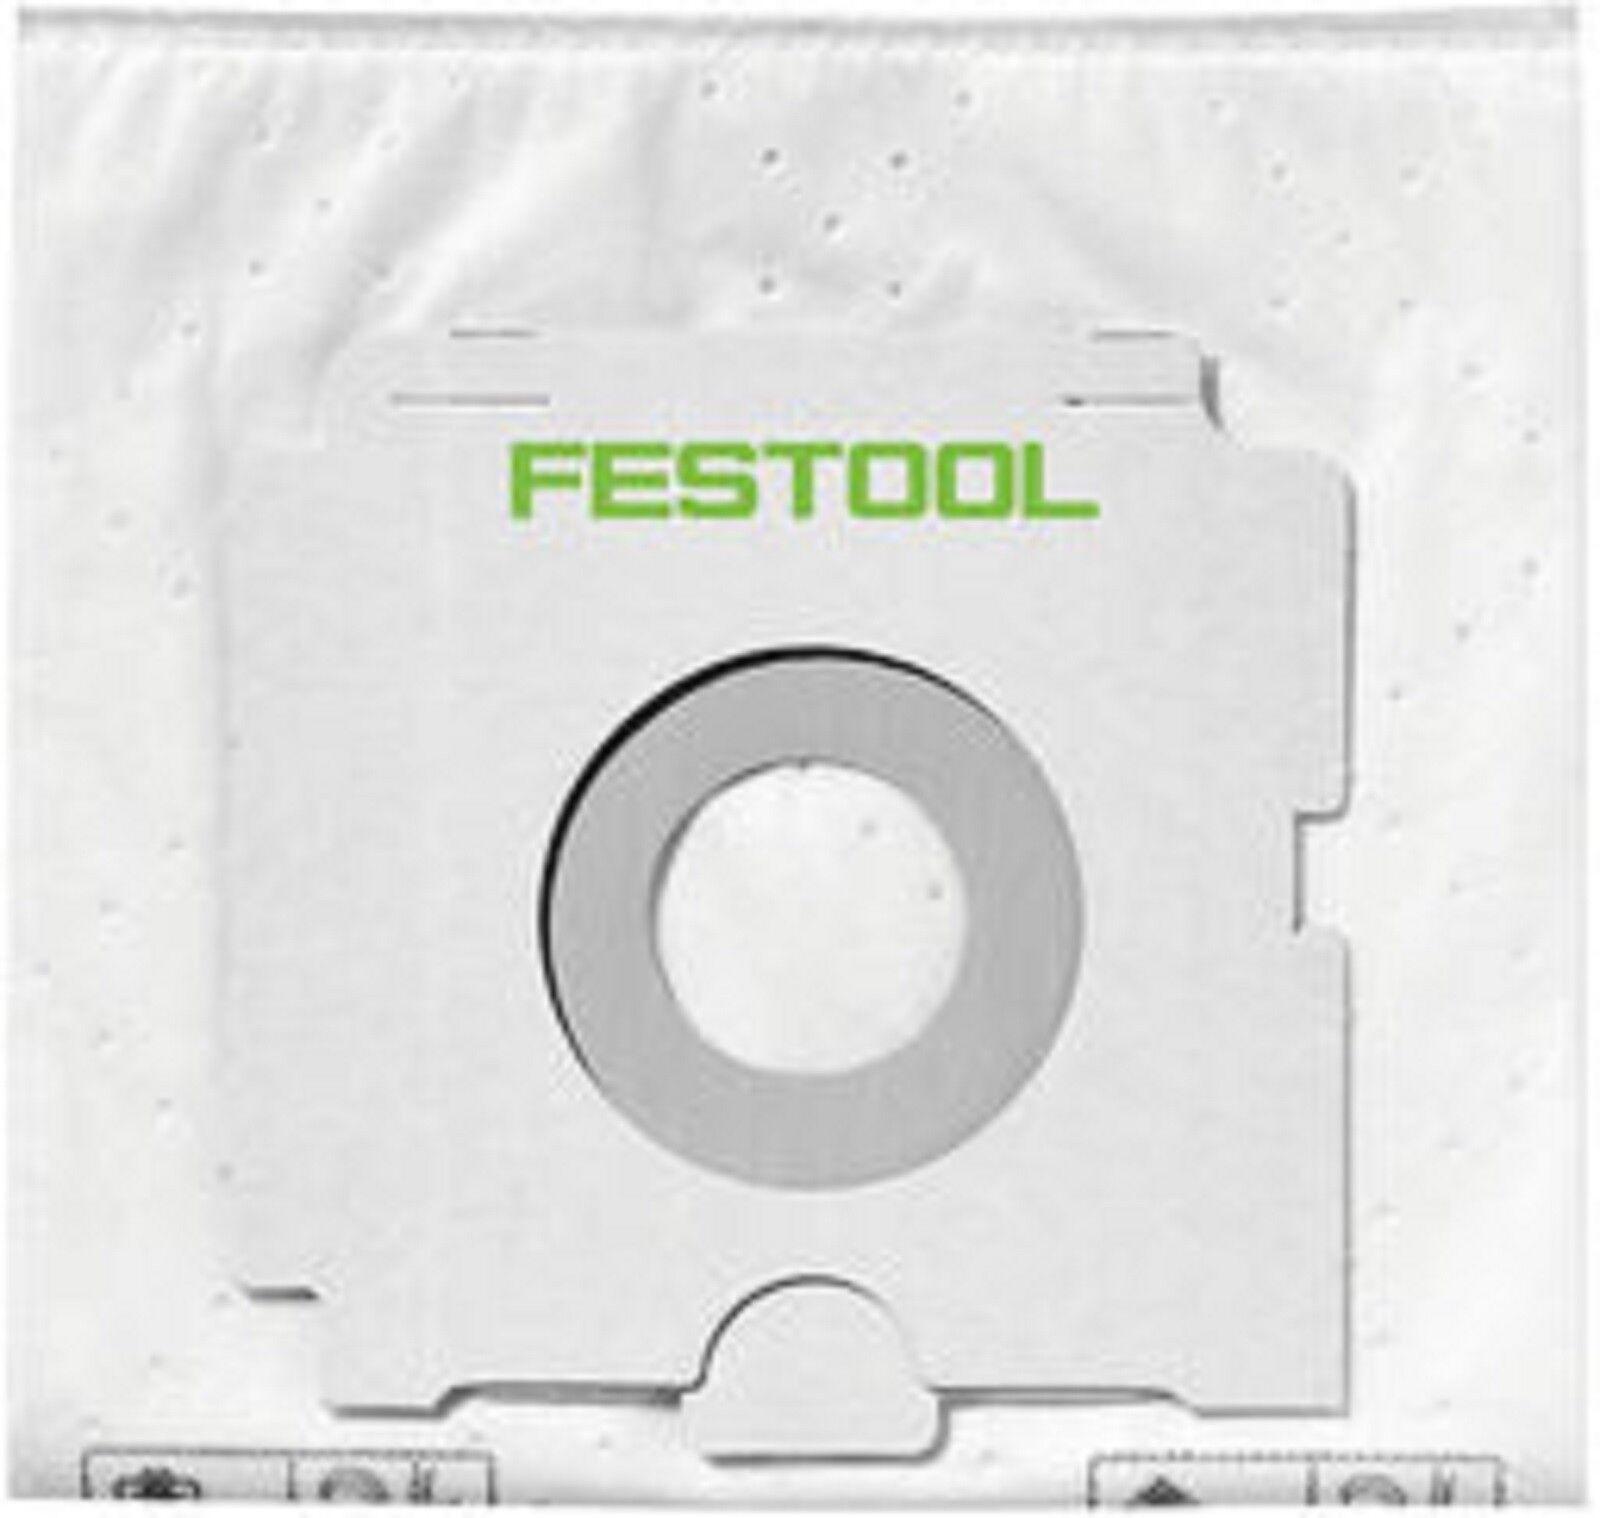 Festool Sacs Filtrants Sc Fis Ct 26 5 Ct26 Sachet Filtre Sac 496187 Poussière